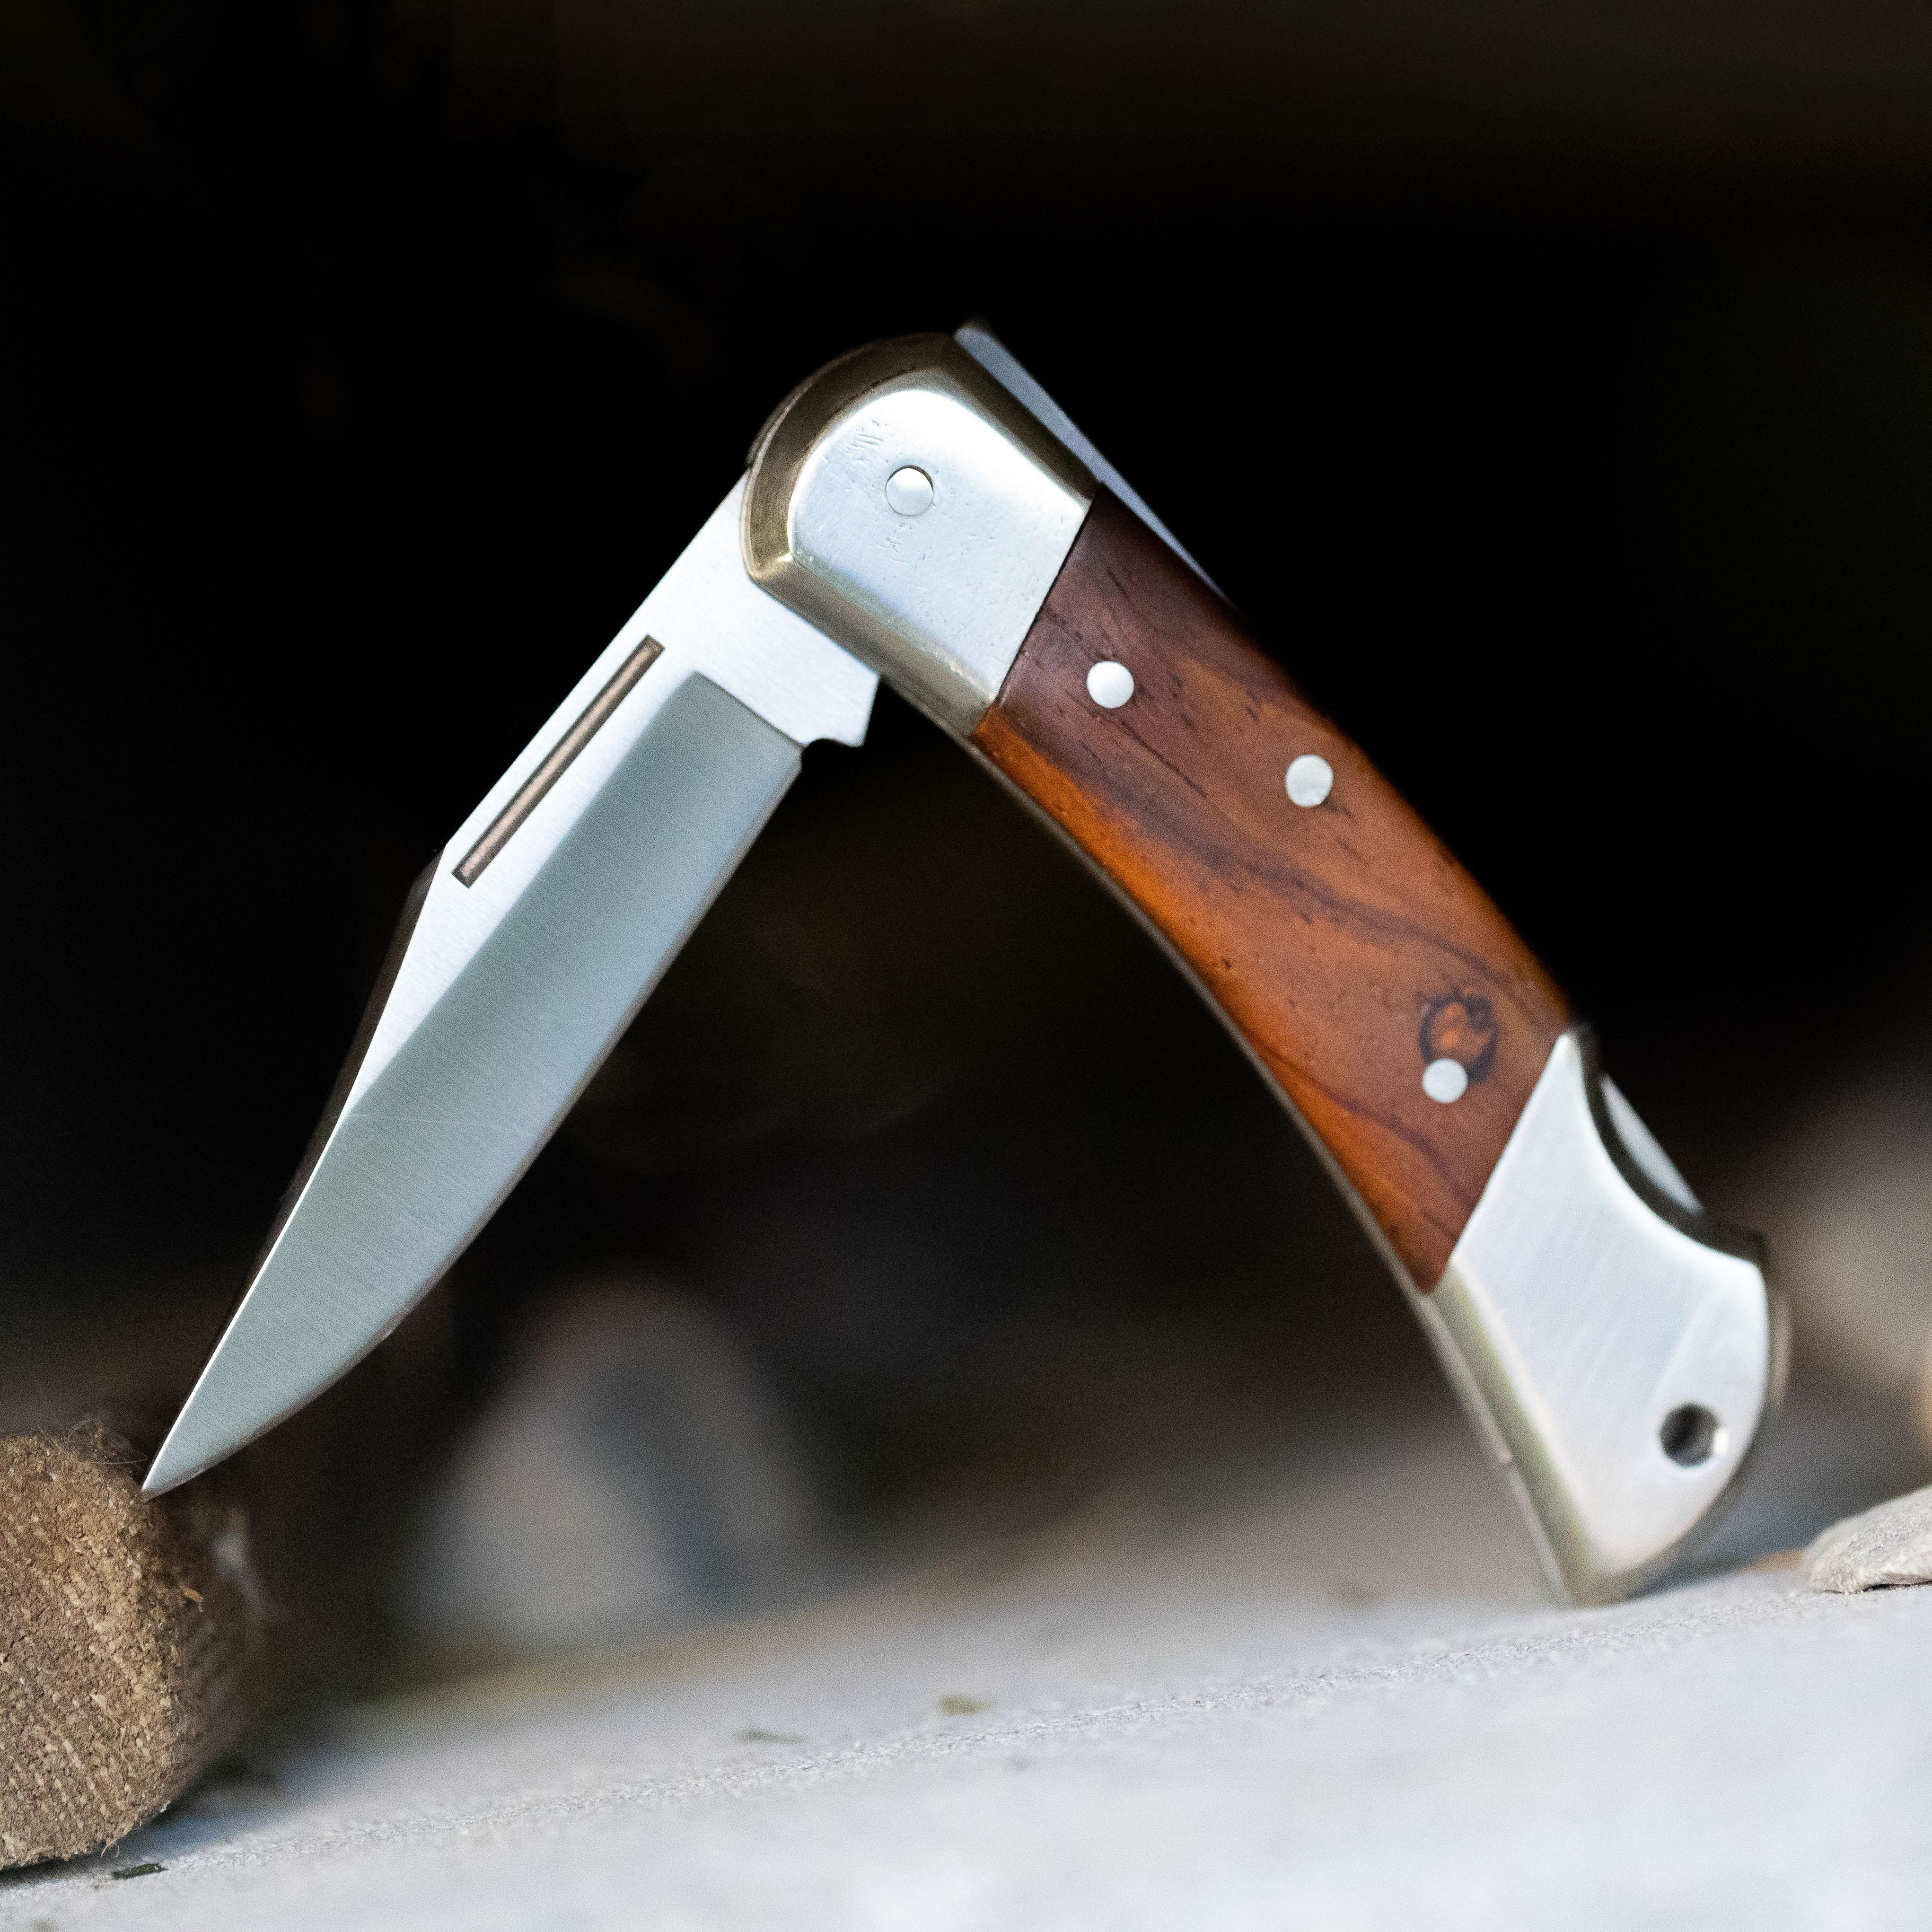 Swallowtail folding knife kit